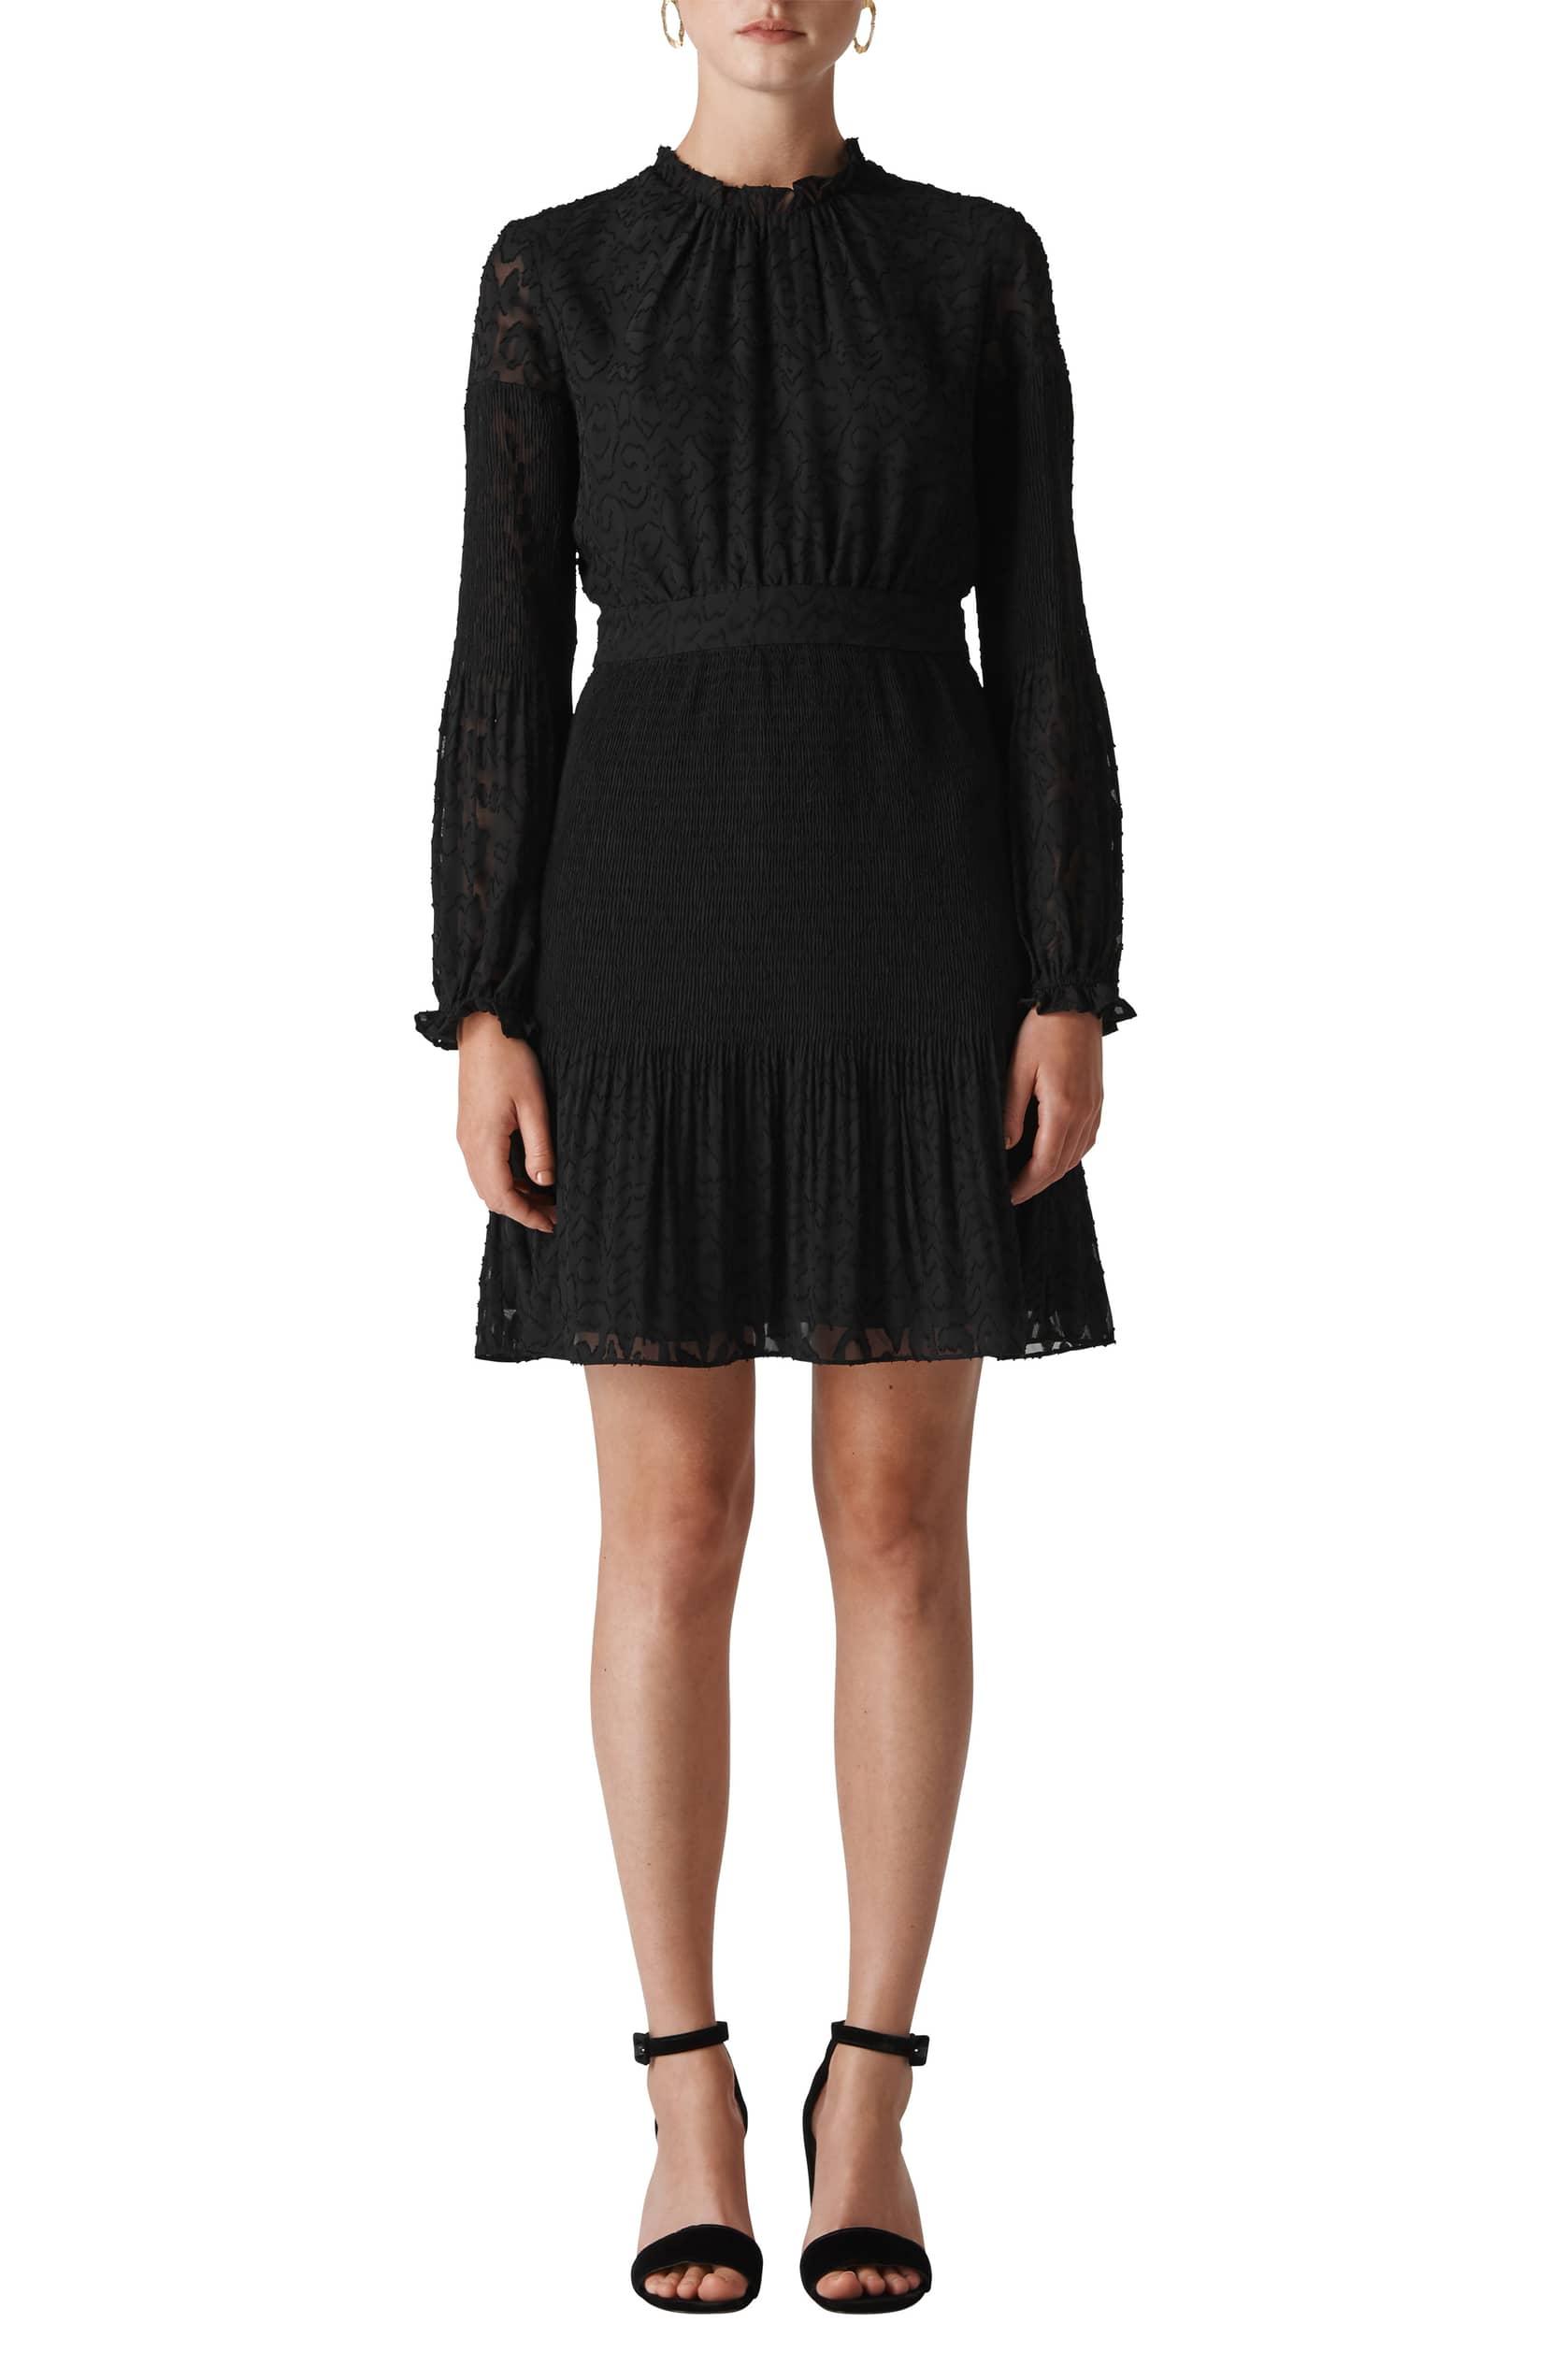 WHISTLES Animal Devoré Pleated Black Dress